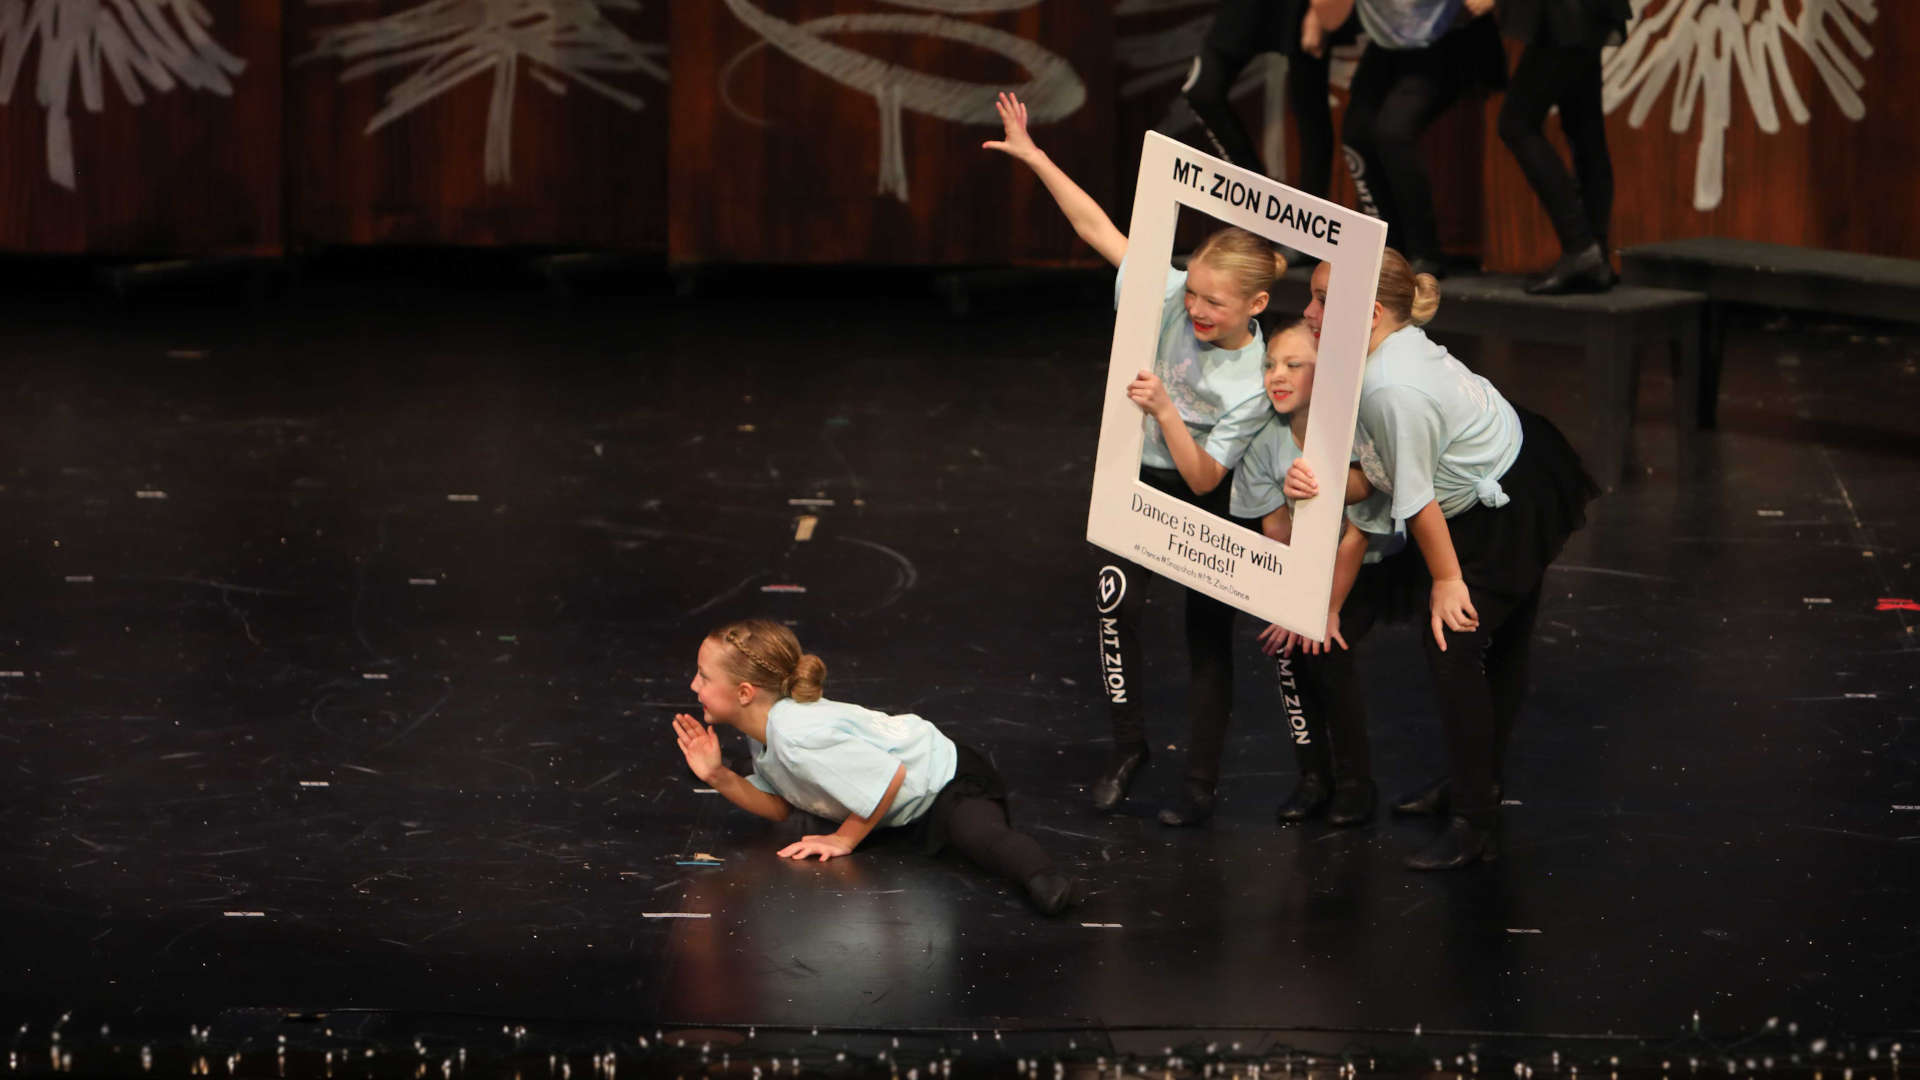 Dance Performance Information